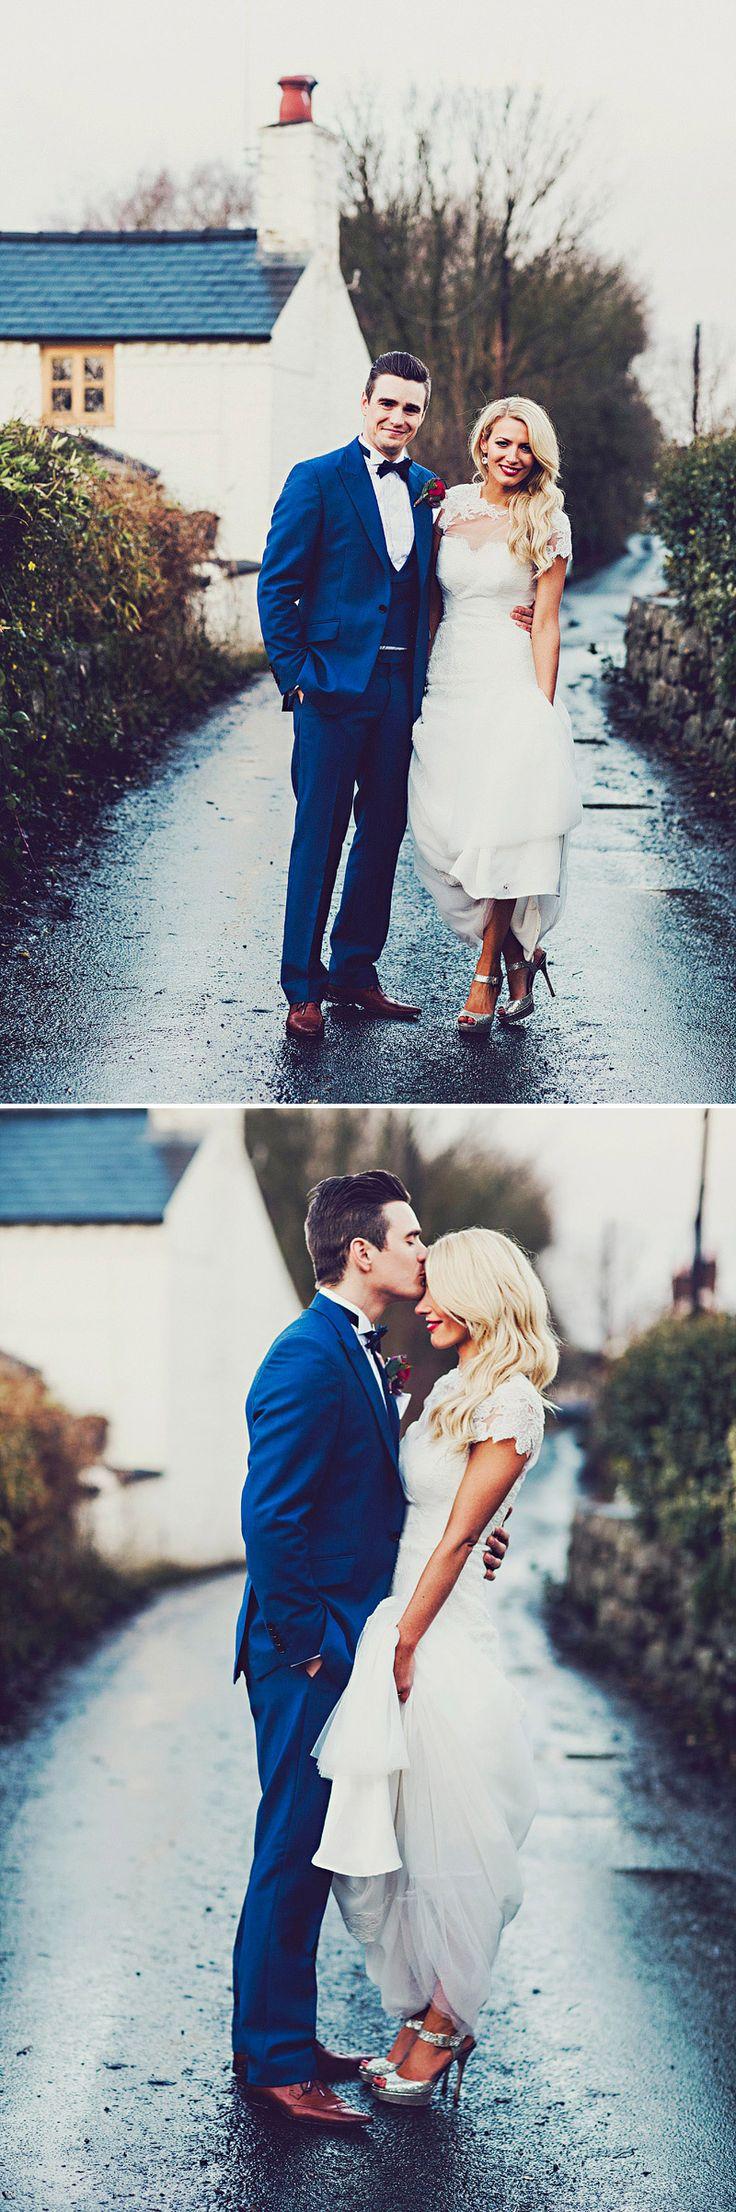 Hollywood Glam Wedding. Shropshire, England Steve Gerrard Portraits Short sleeve wedding dress with ace illusion neckline. #weddingdresssleeves